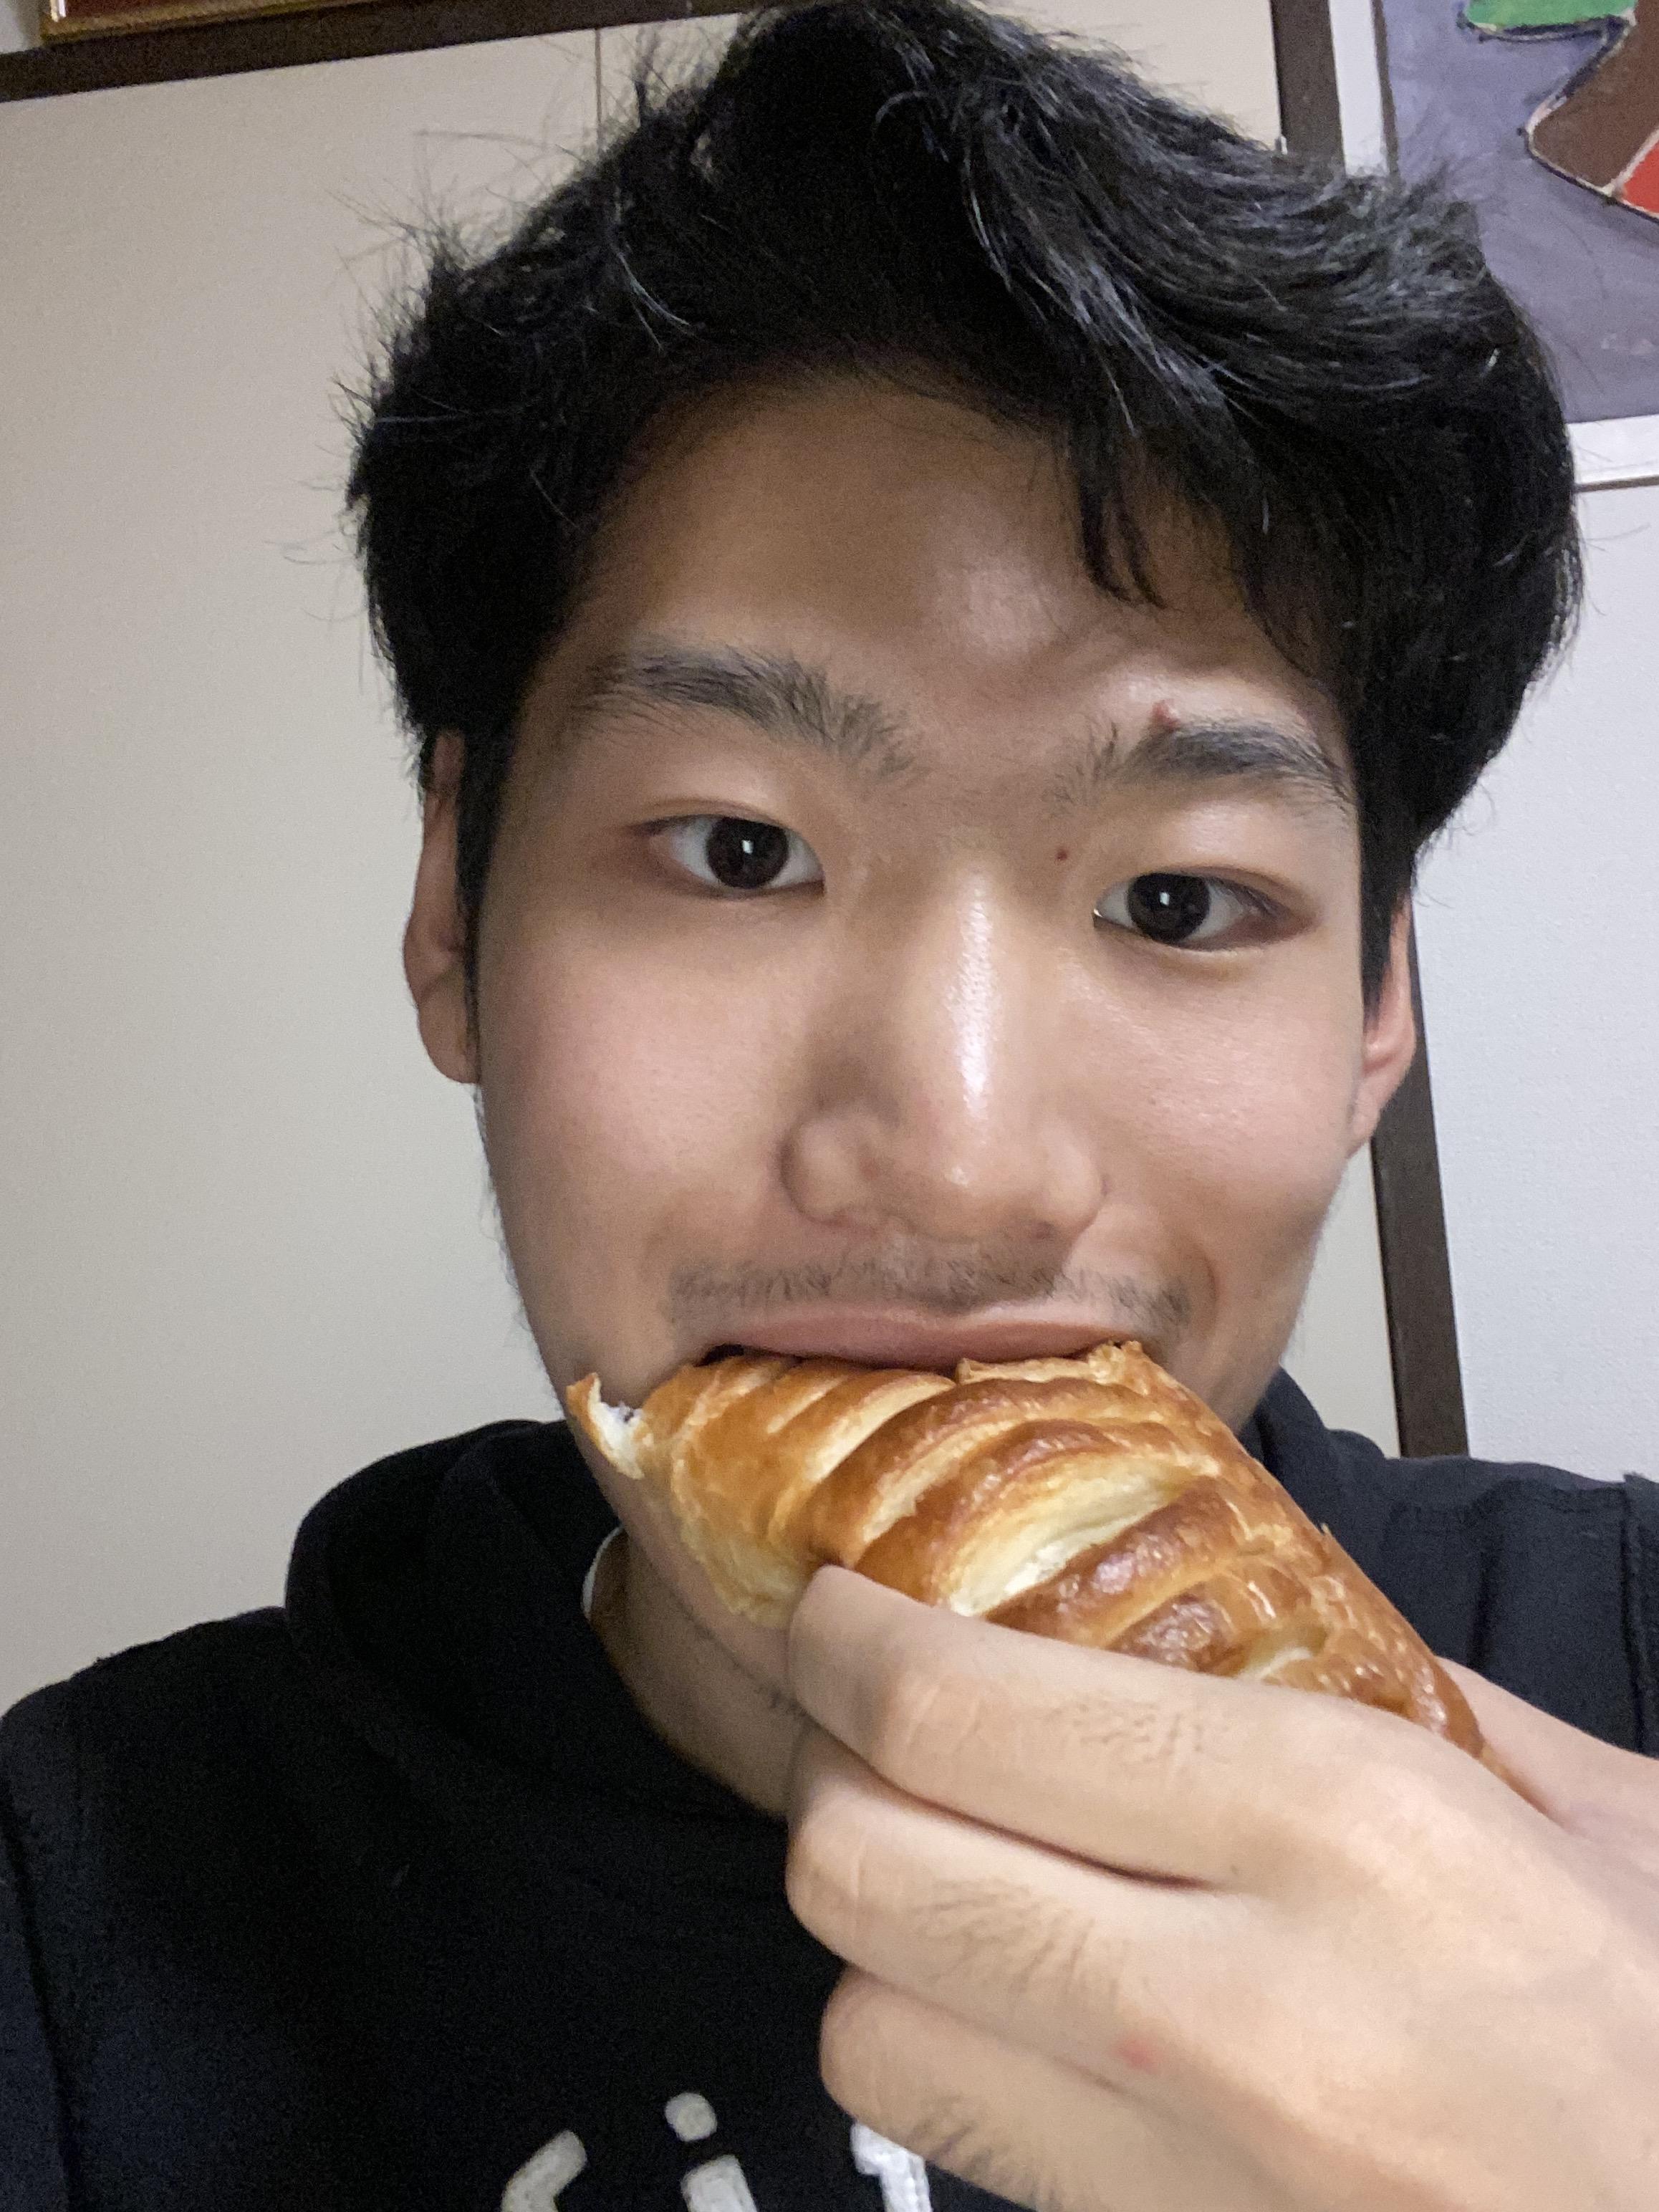 Thumbnail of デニッシュ生地ベースのクリームパン